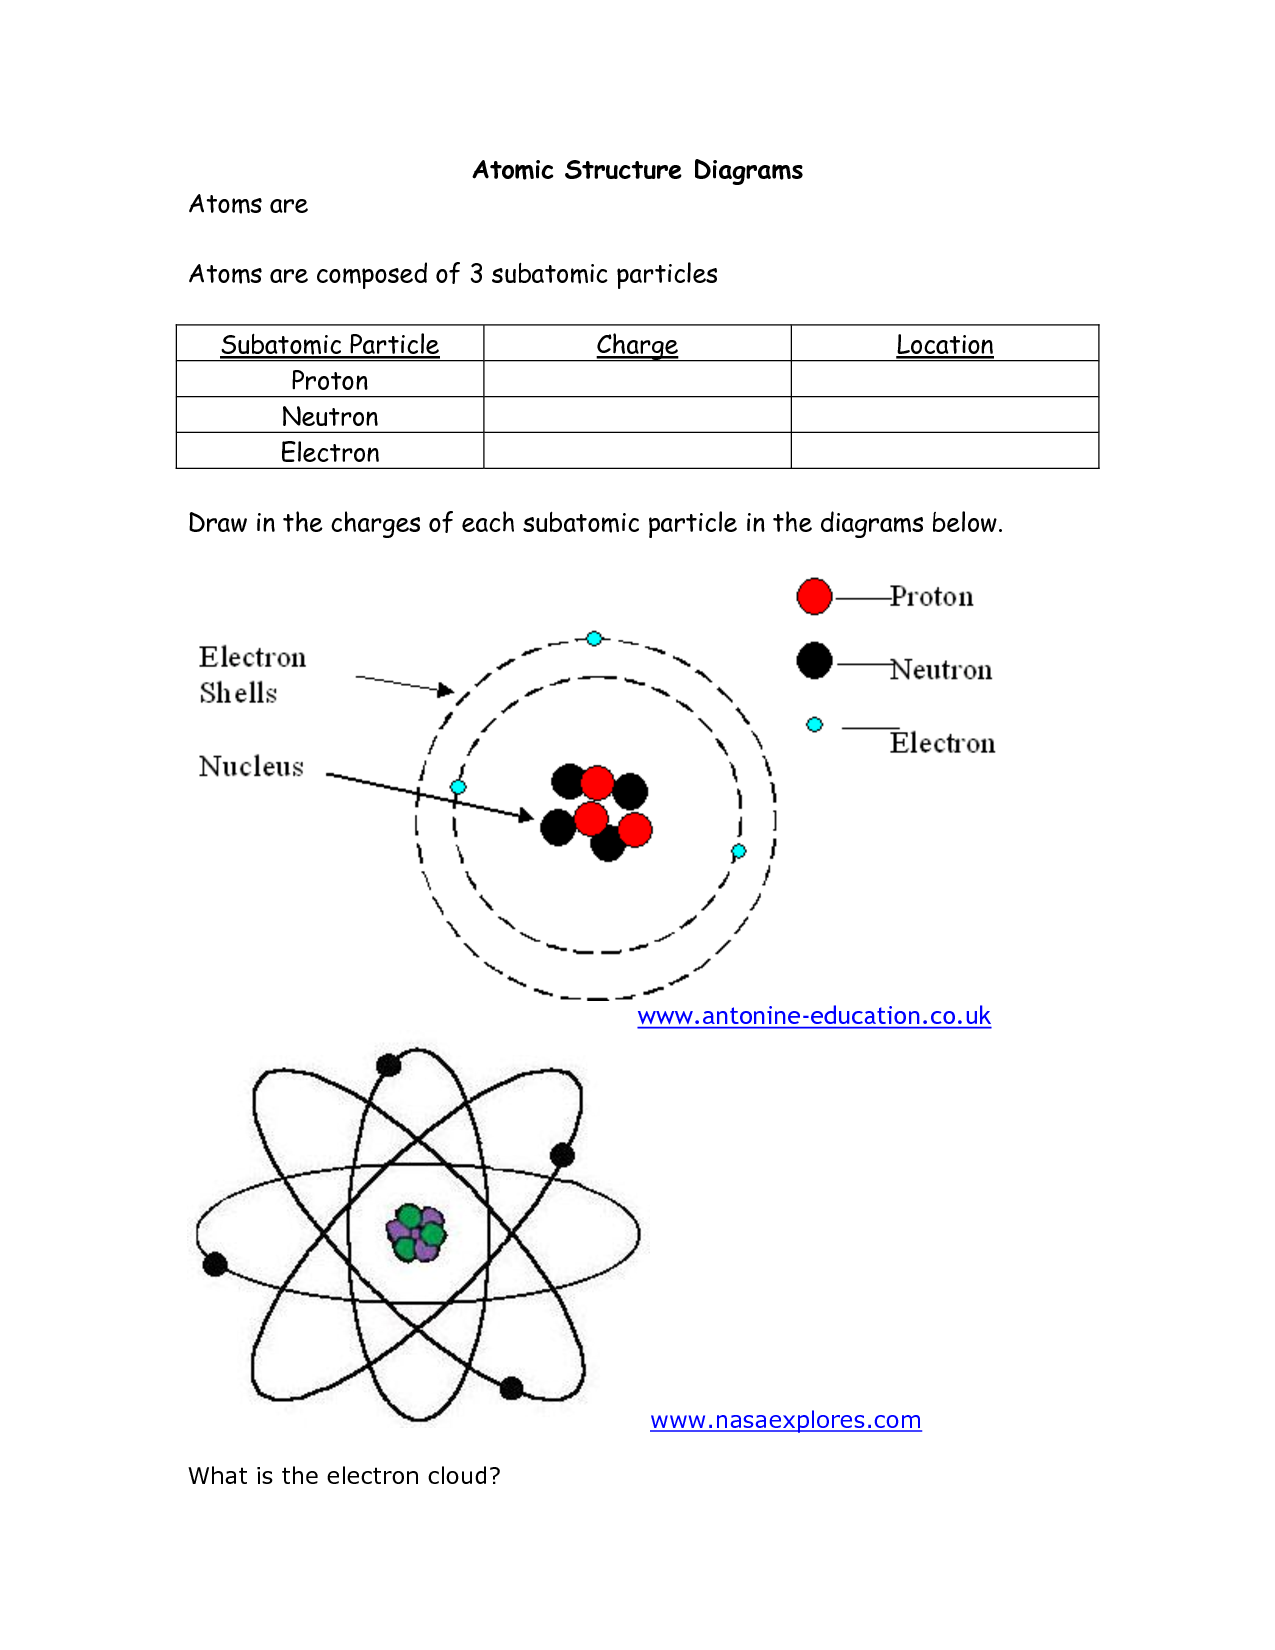 atomic structure diagram worksheet atomic structure diagrams [ 1275 x 1650 Pixel ]